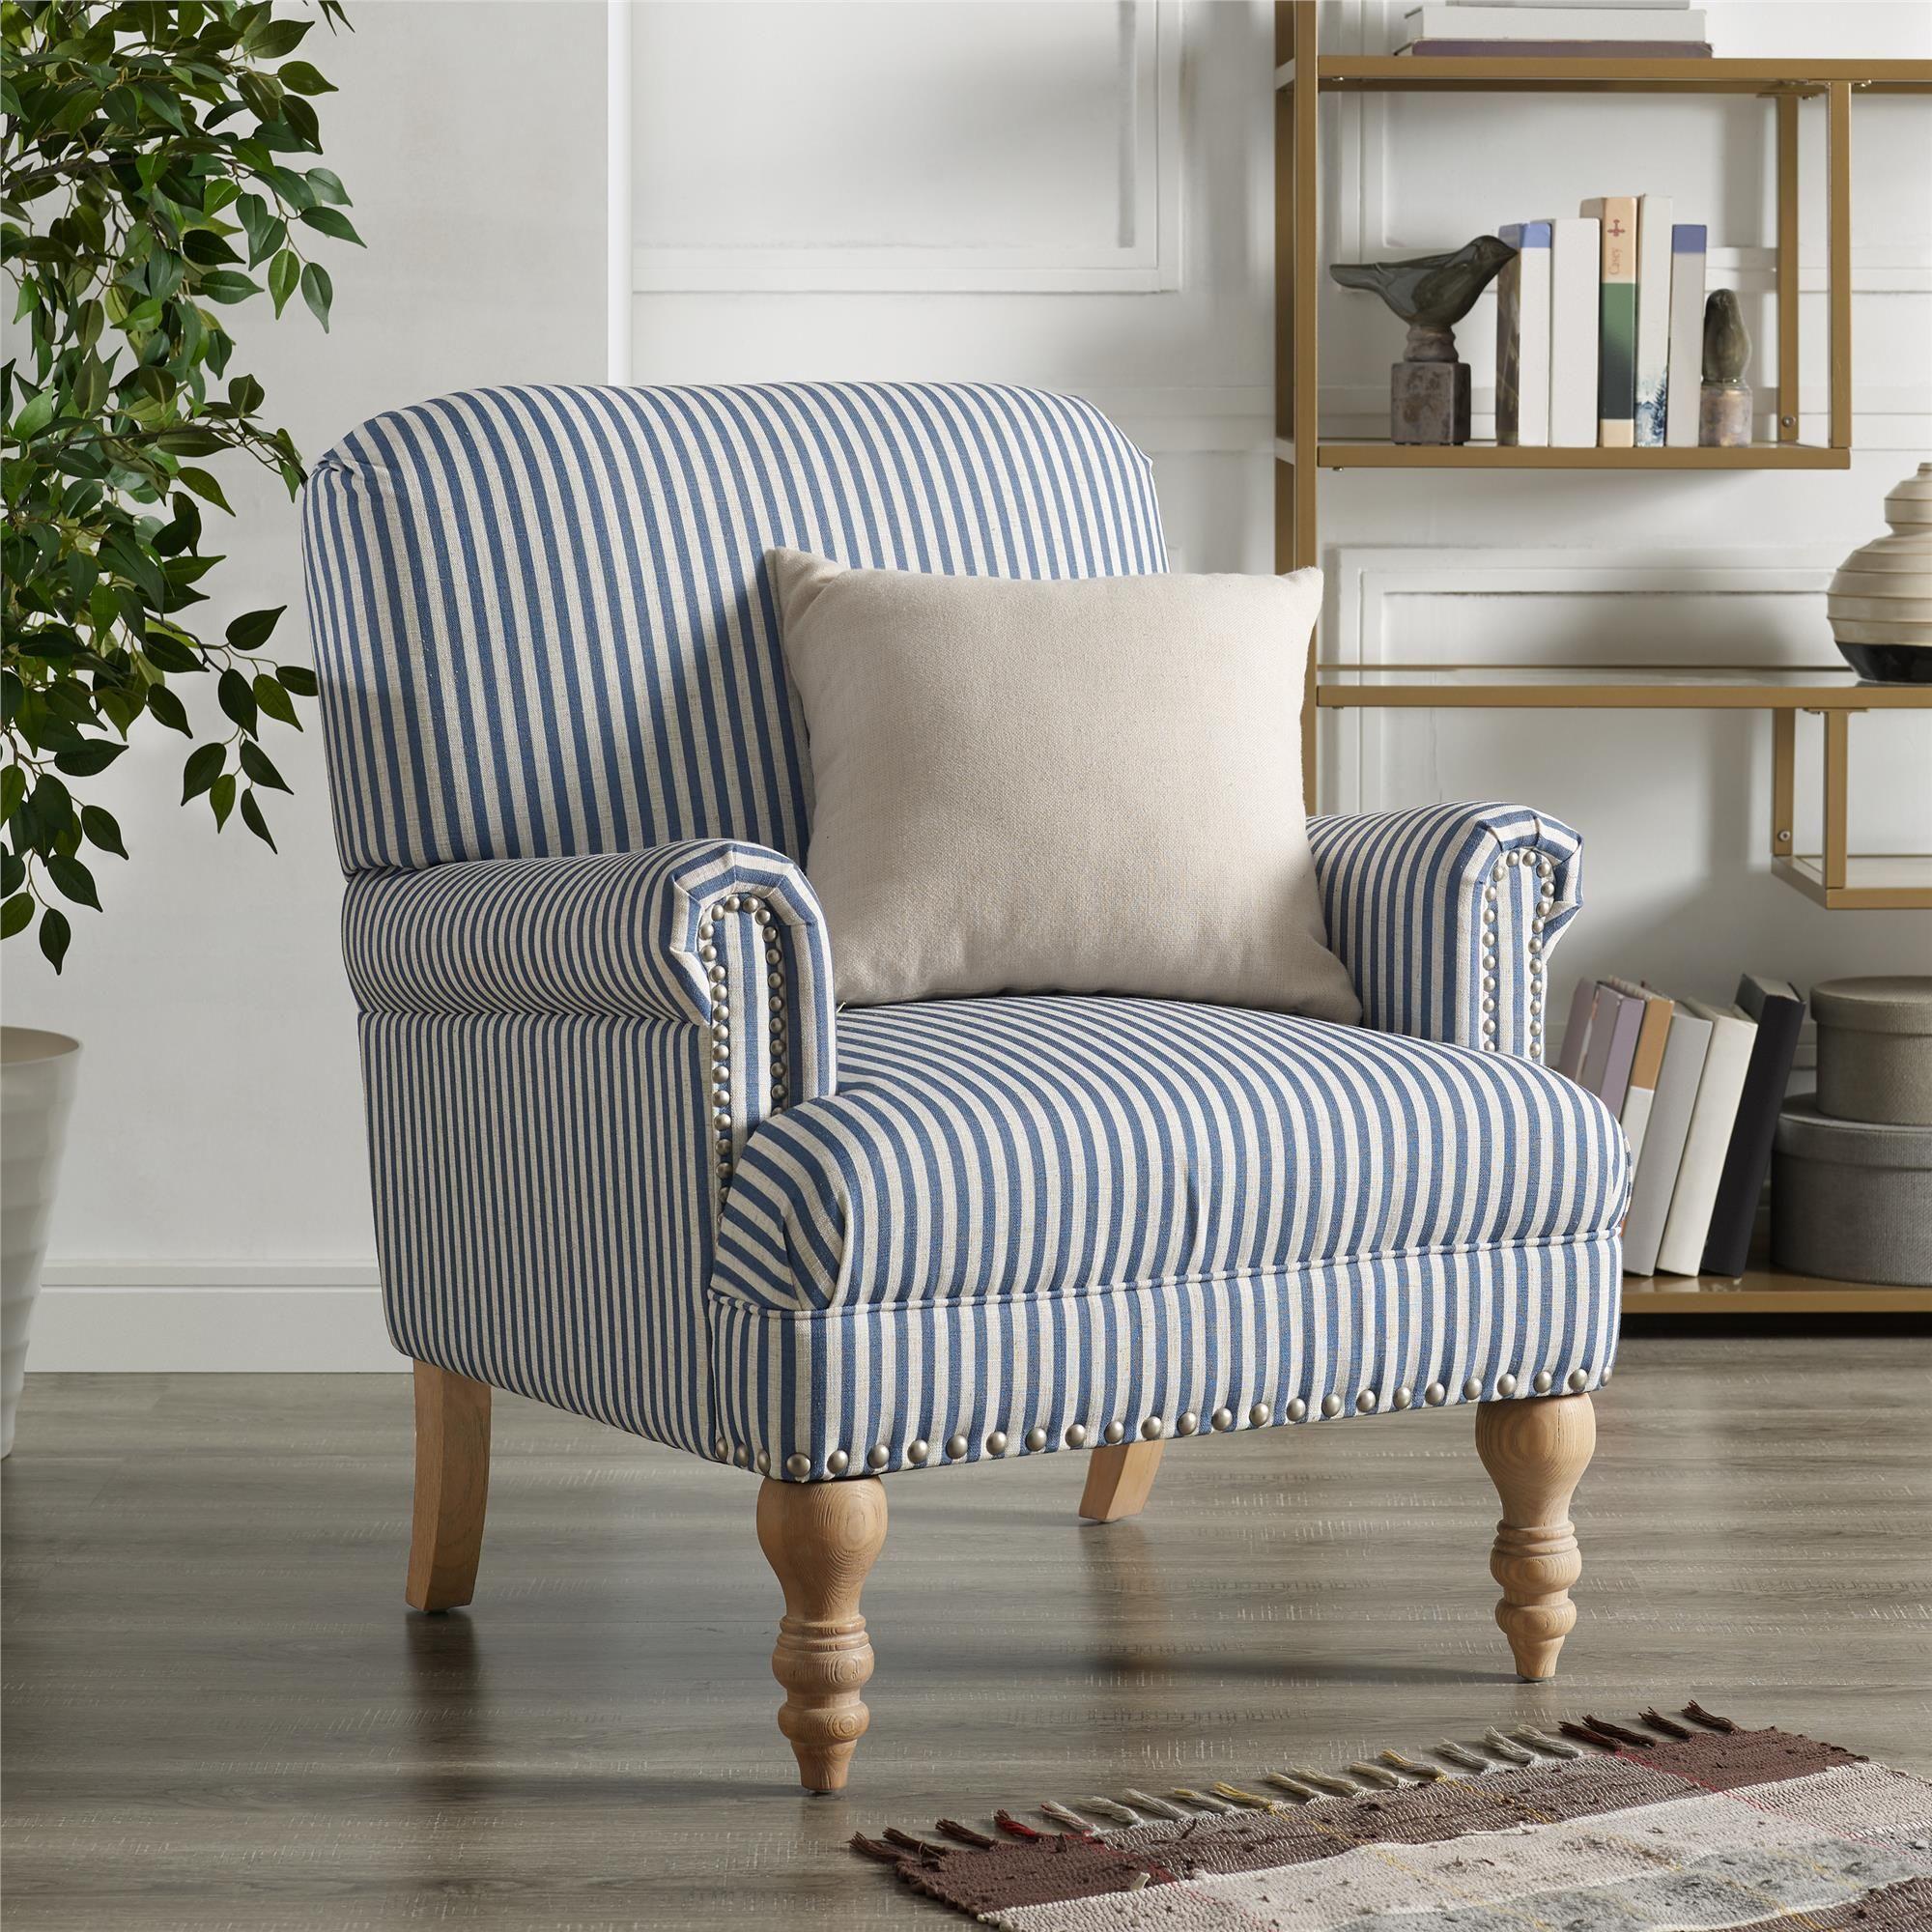 Dorel Living Jaya Accent Chair Living Room Armchairs Blue Stripe Walmart Com In 2021 Blue Accent Chairs Dorel Living Stripe Accent Chair